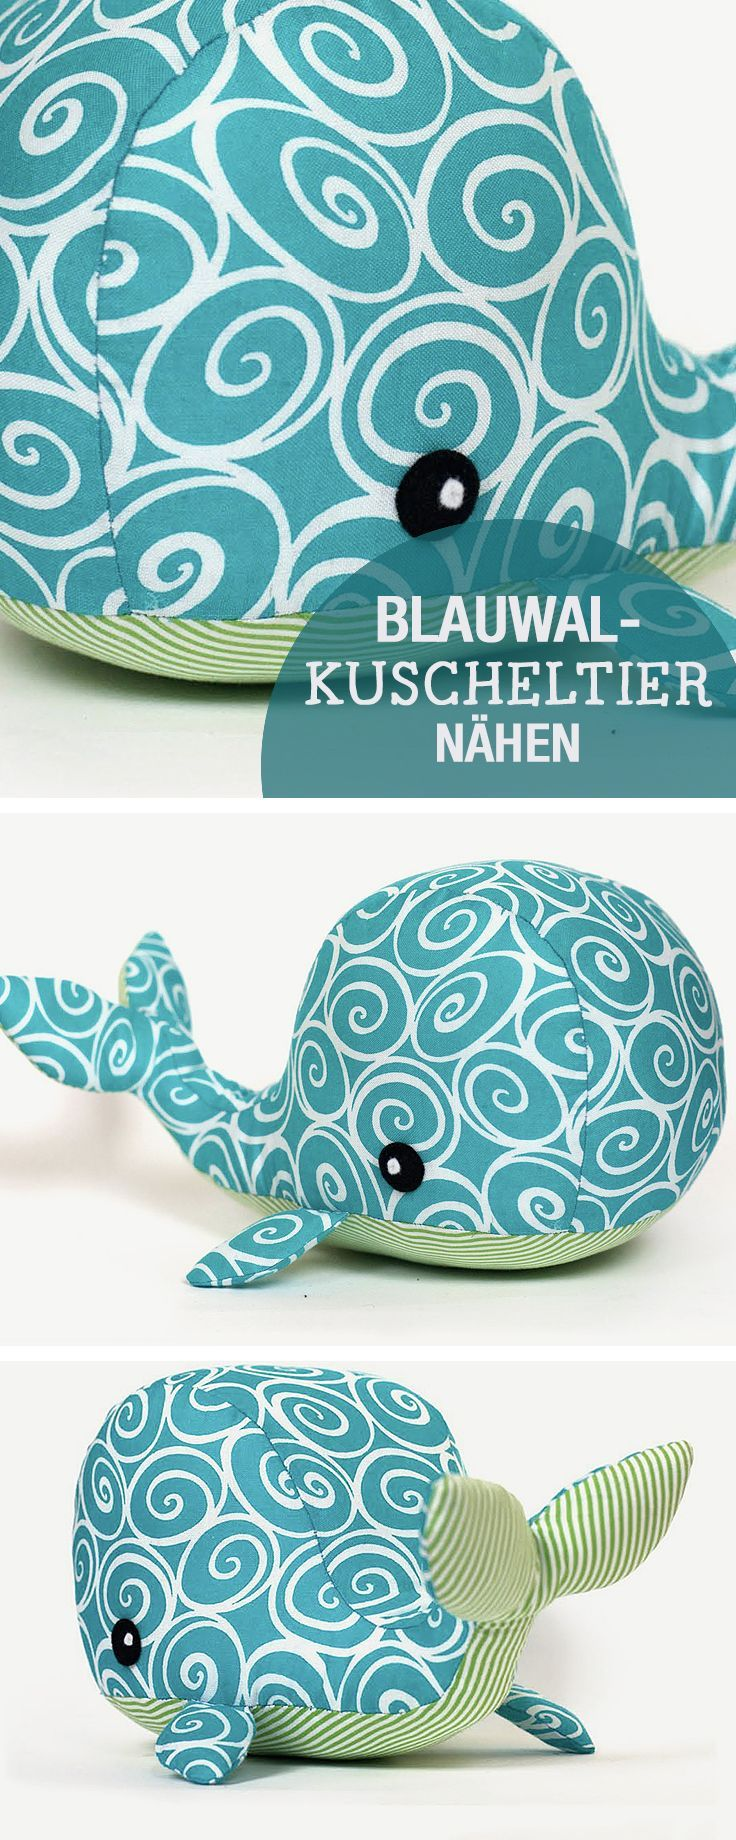 DIY-Nähanleitung: Blauwal Kuscheltier nähen, Nähen für Kinder / diy sewing tutorial: whale soft toy, kids sewing ideas via DaWanda.com #toysforbabies